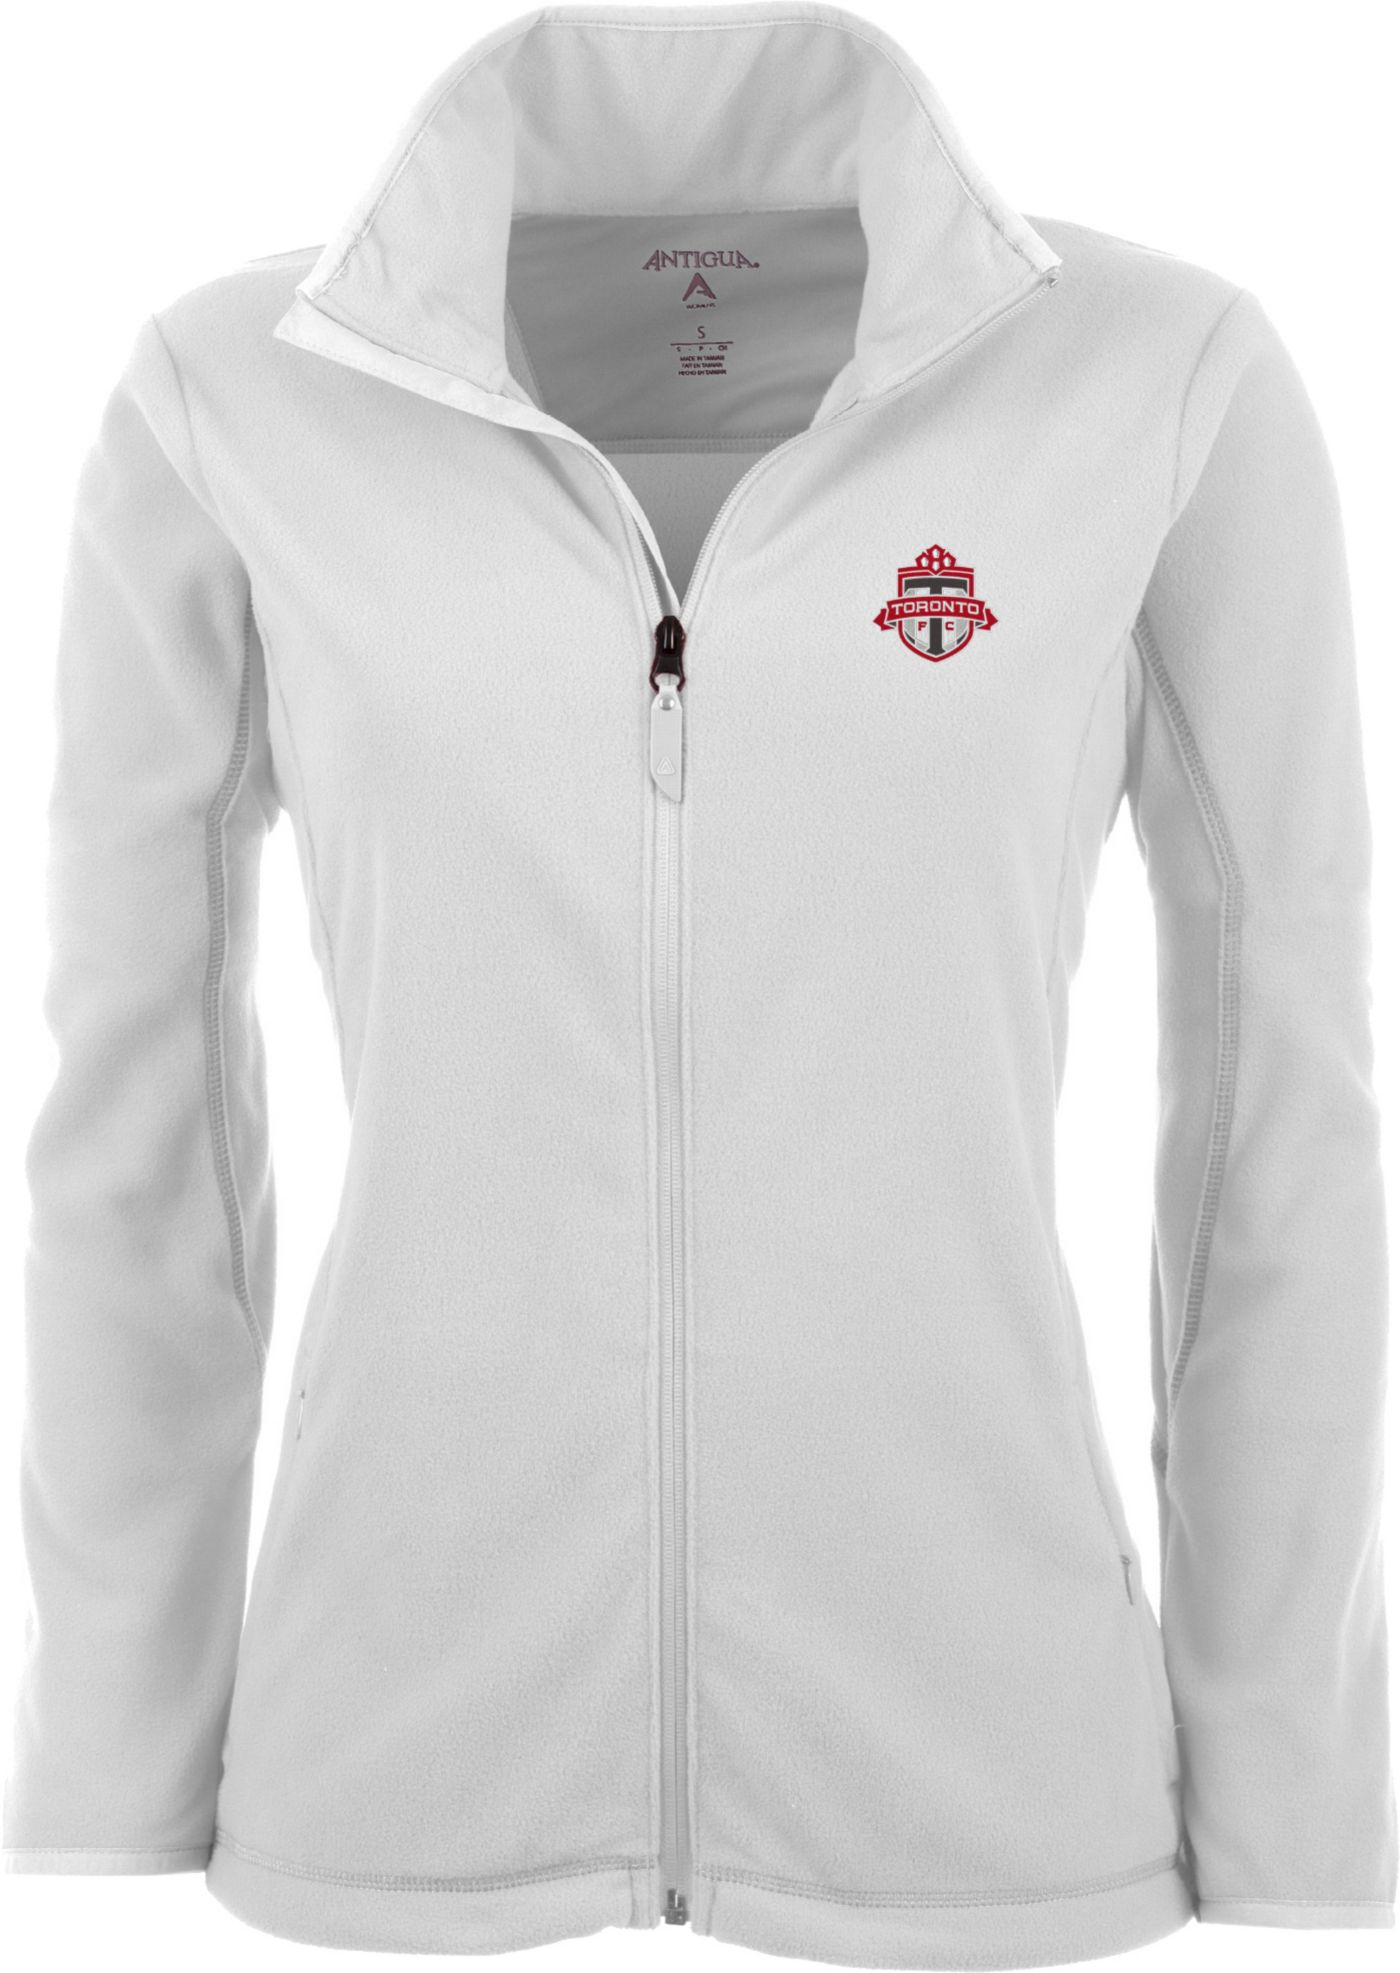 Antigua Women's Toronto FC White Ice Full-Zip Fleece Jacket